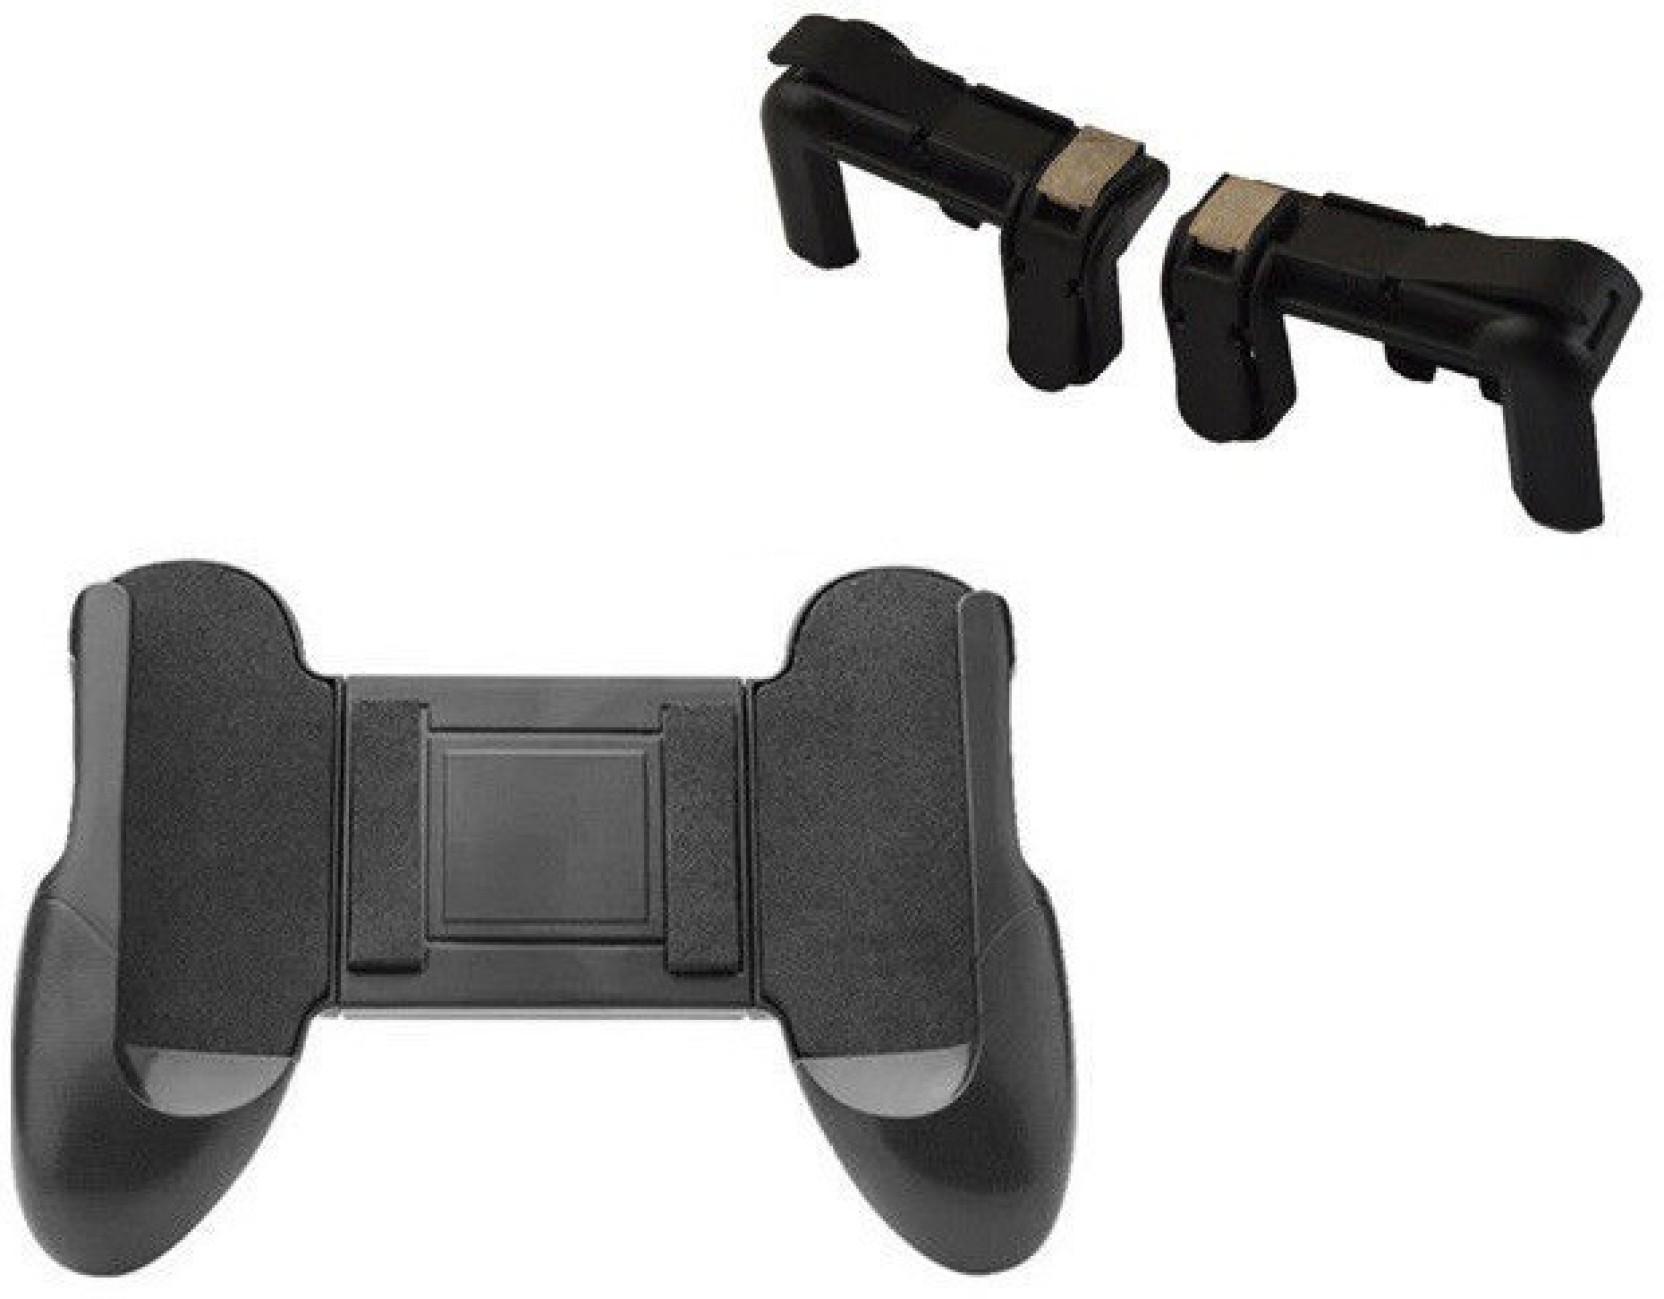 Roq Pubg Sensitive Shoot Aim Buttons L1 R1 Trigger With Portable Paket Lengkap Gamers Gamepad Standing